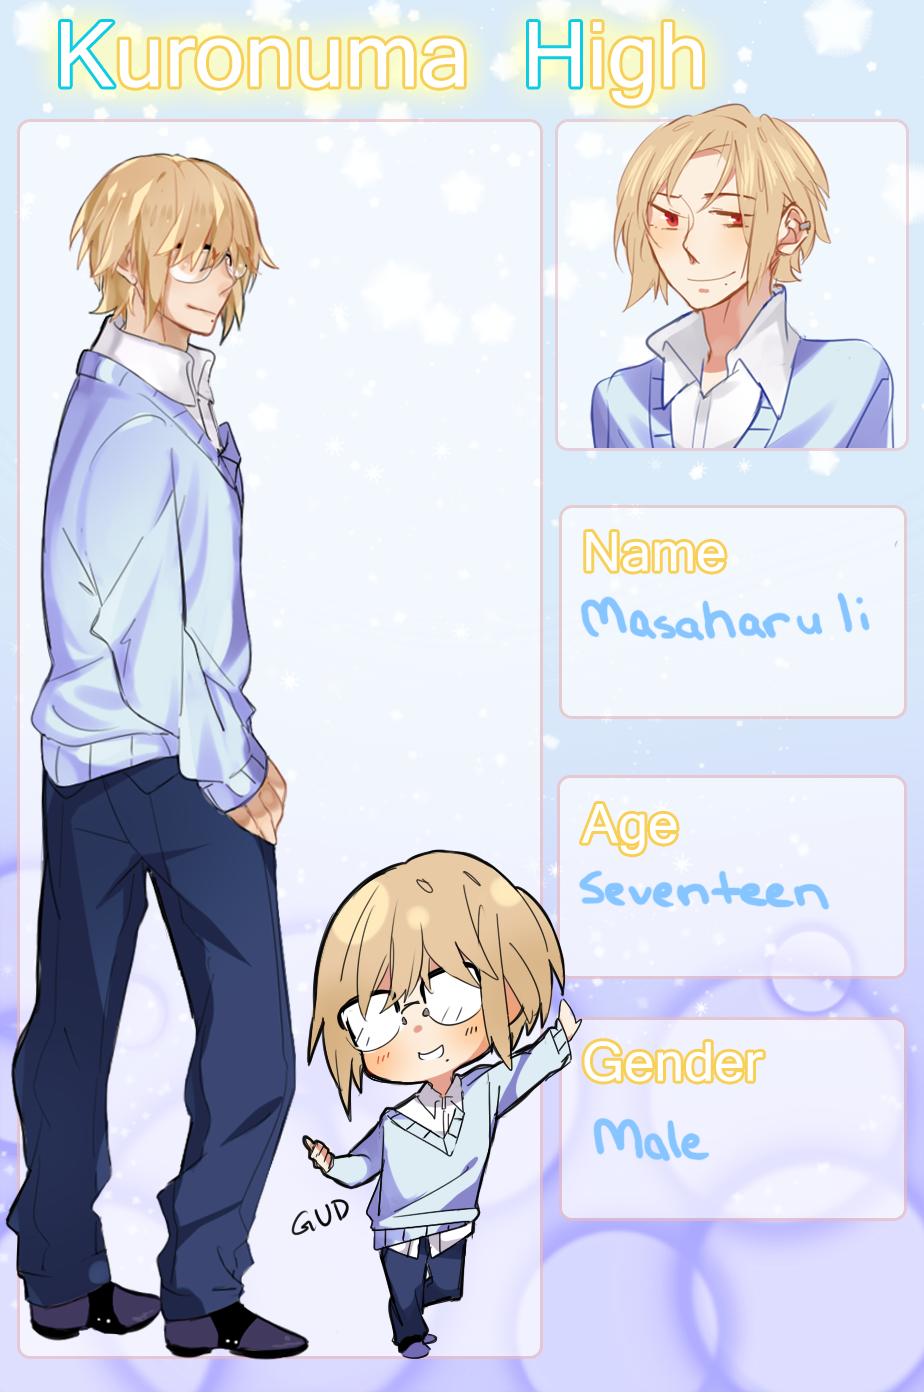 KH: Masaharu Ii by Renn-kun